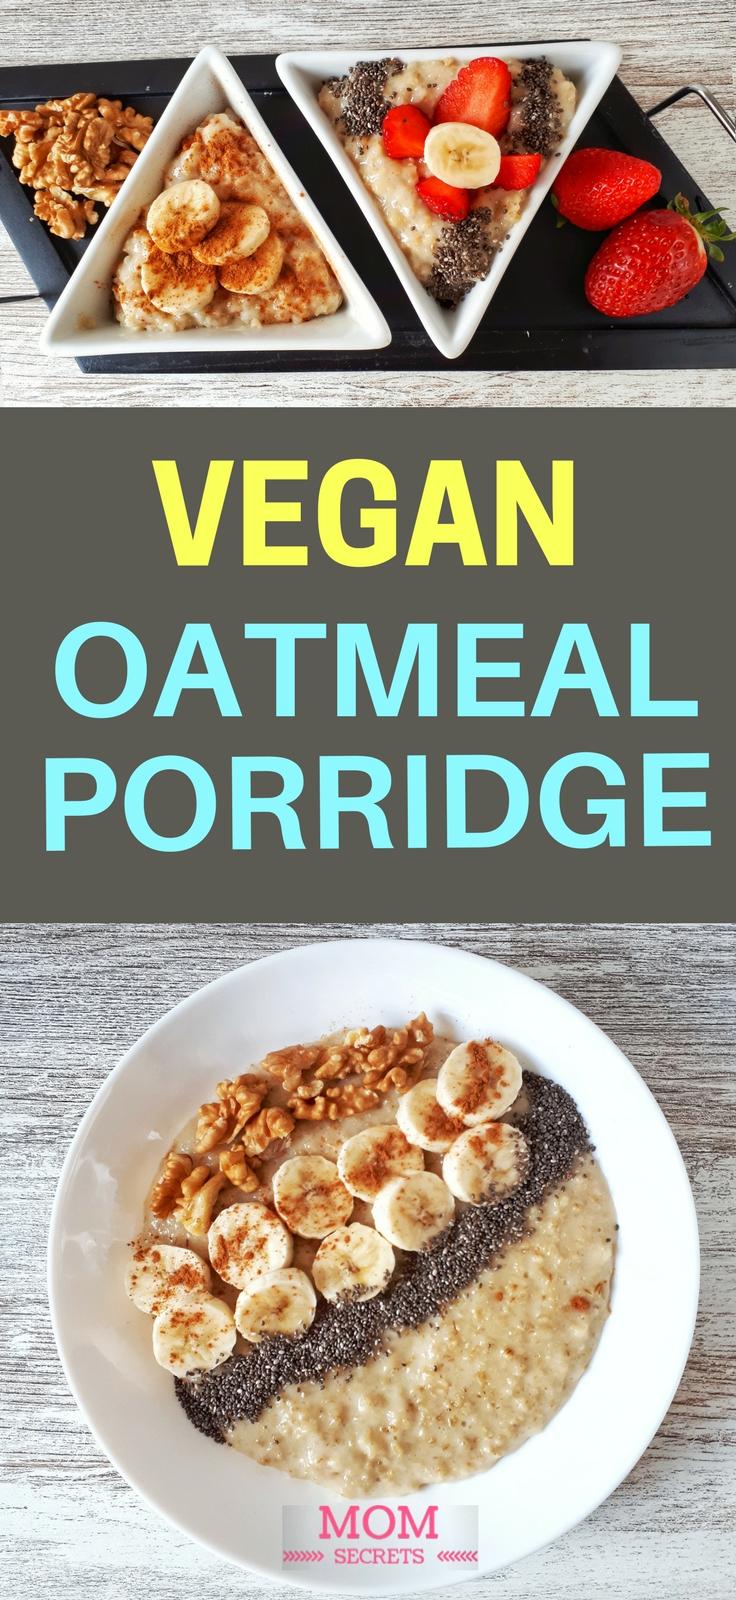 This creamy banana porridge is simply the best breakfast! It's an easy, quick and healthy recipe. Banana oatmeal porridge makes a brilliant vegan breakfast!